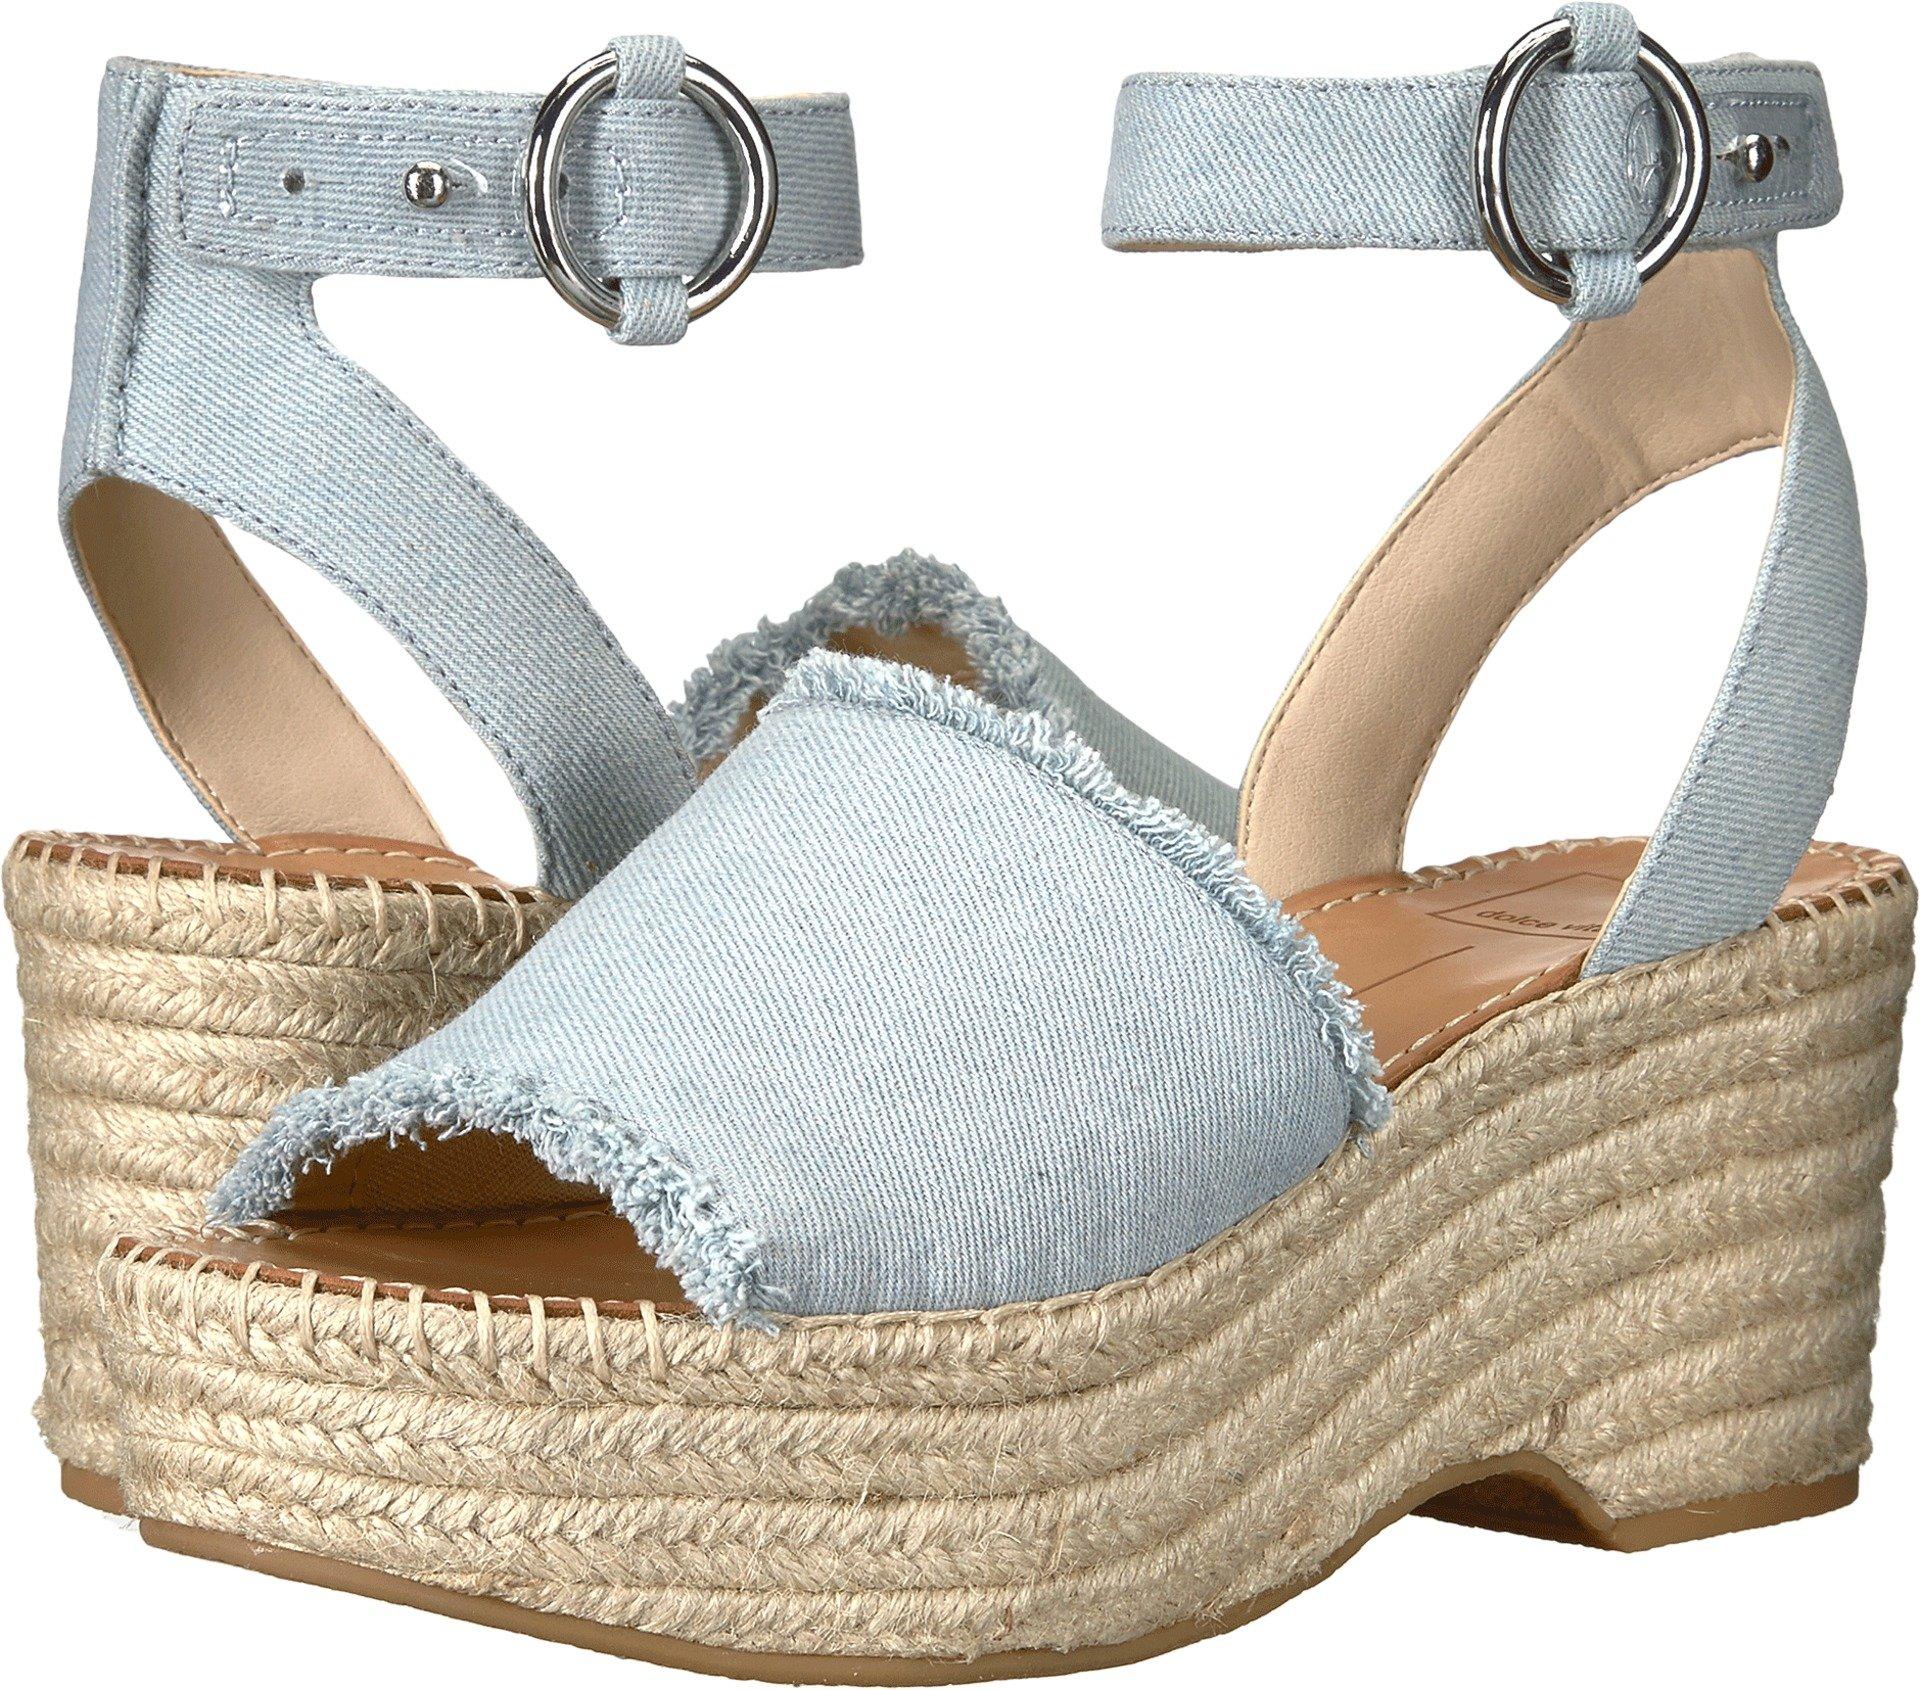 Dolce Vita Women's Lesly Espadrille Wedge Sandal, Light Blue Denim, 7.5 M US by Dolce Vita (Image #1)